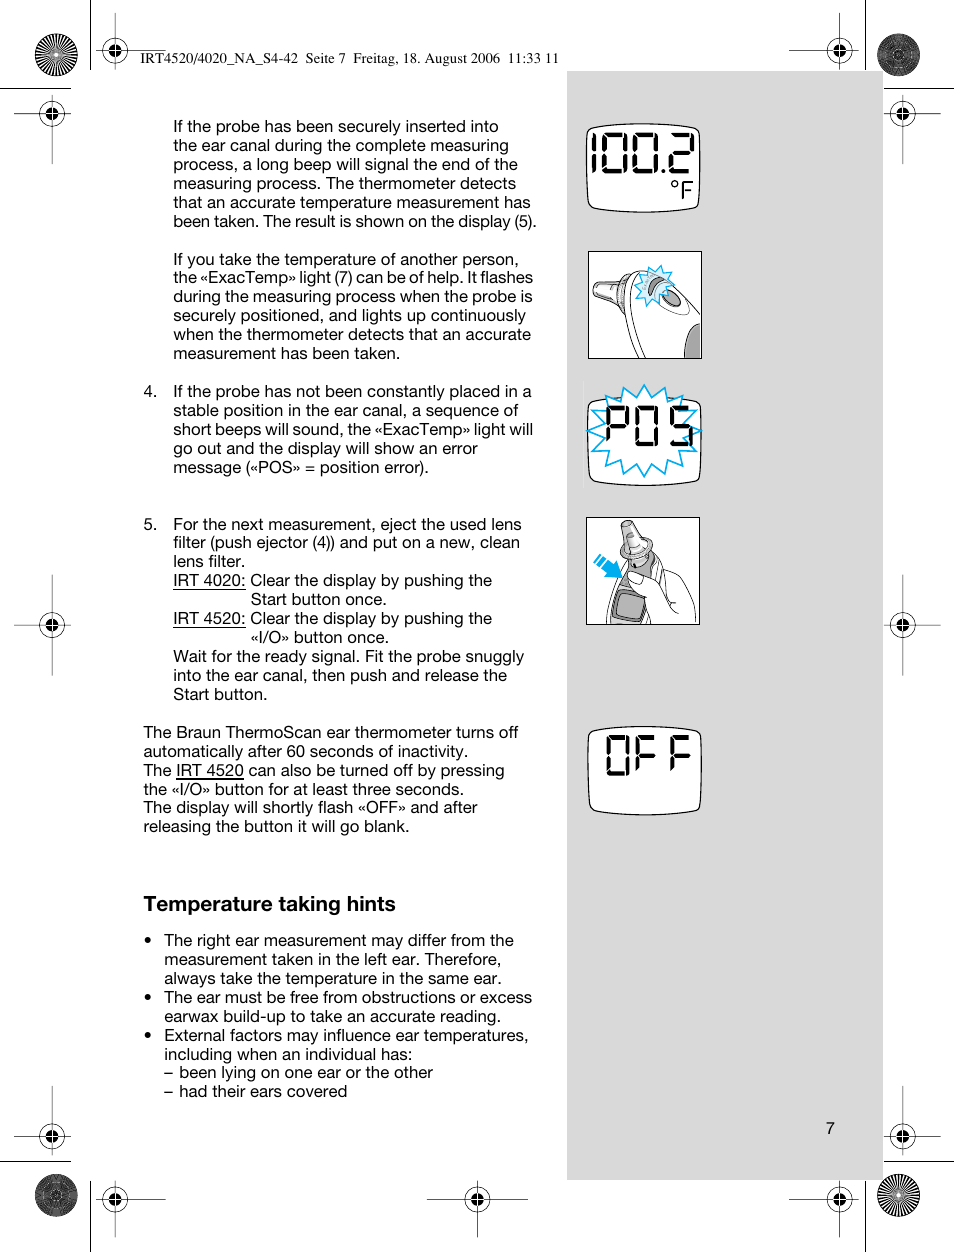 temperature taking hints braun thermoscan irt 4520 user manual rh manualsdir com Braun Thermometer Manual braun thermoscan irt 4020 manuel